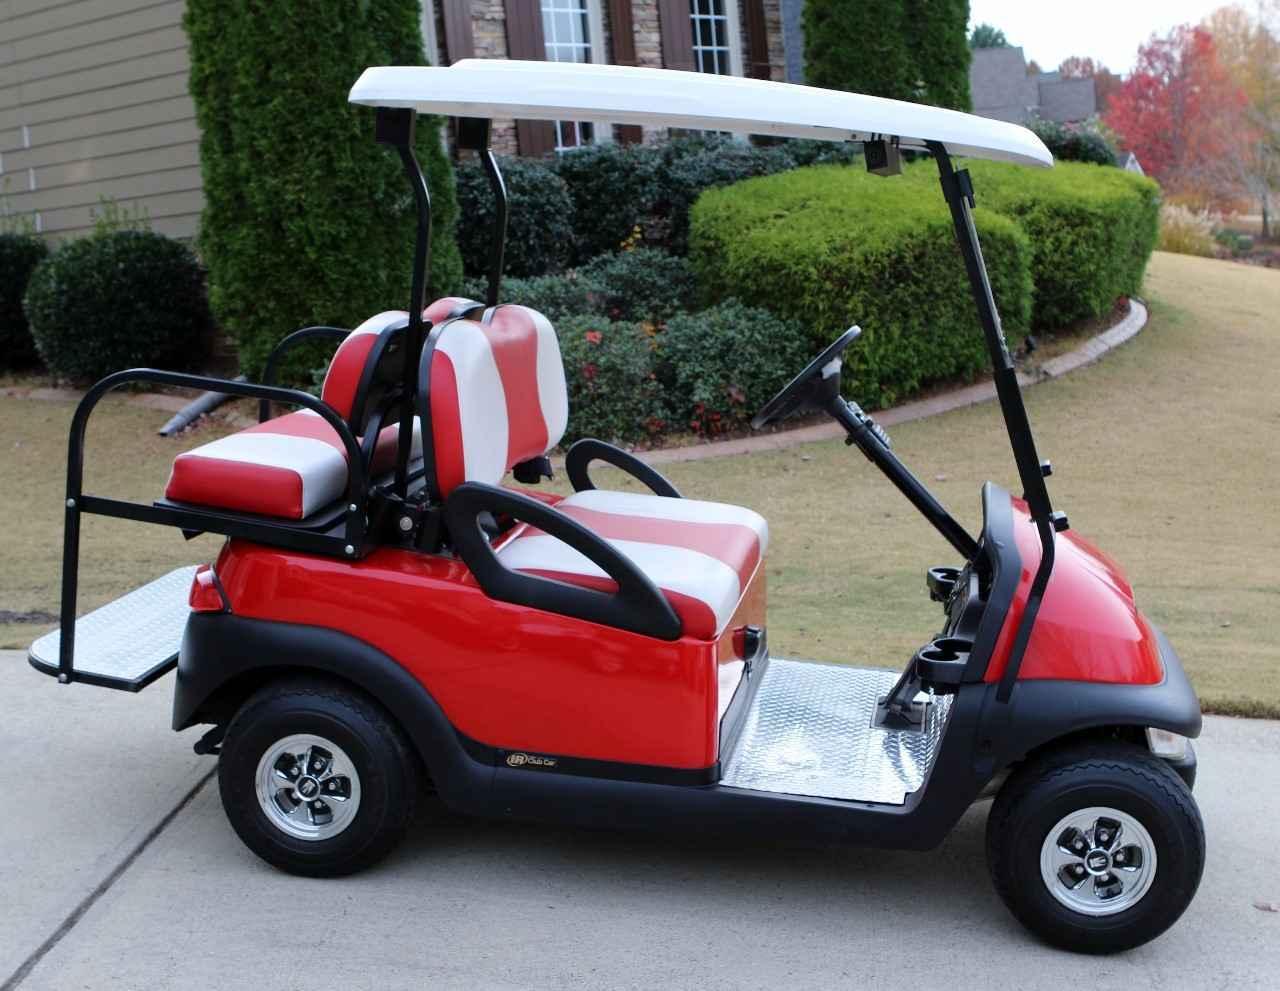 yamaha golf carts oklahoma vw bug wiring diagram used 2006 club car electric atvs for sale in georgia on